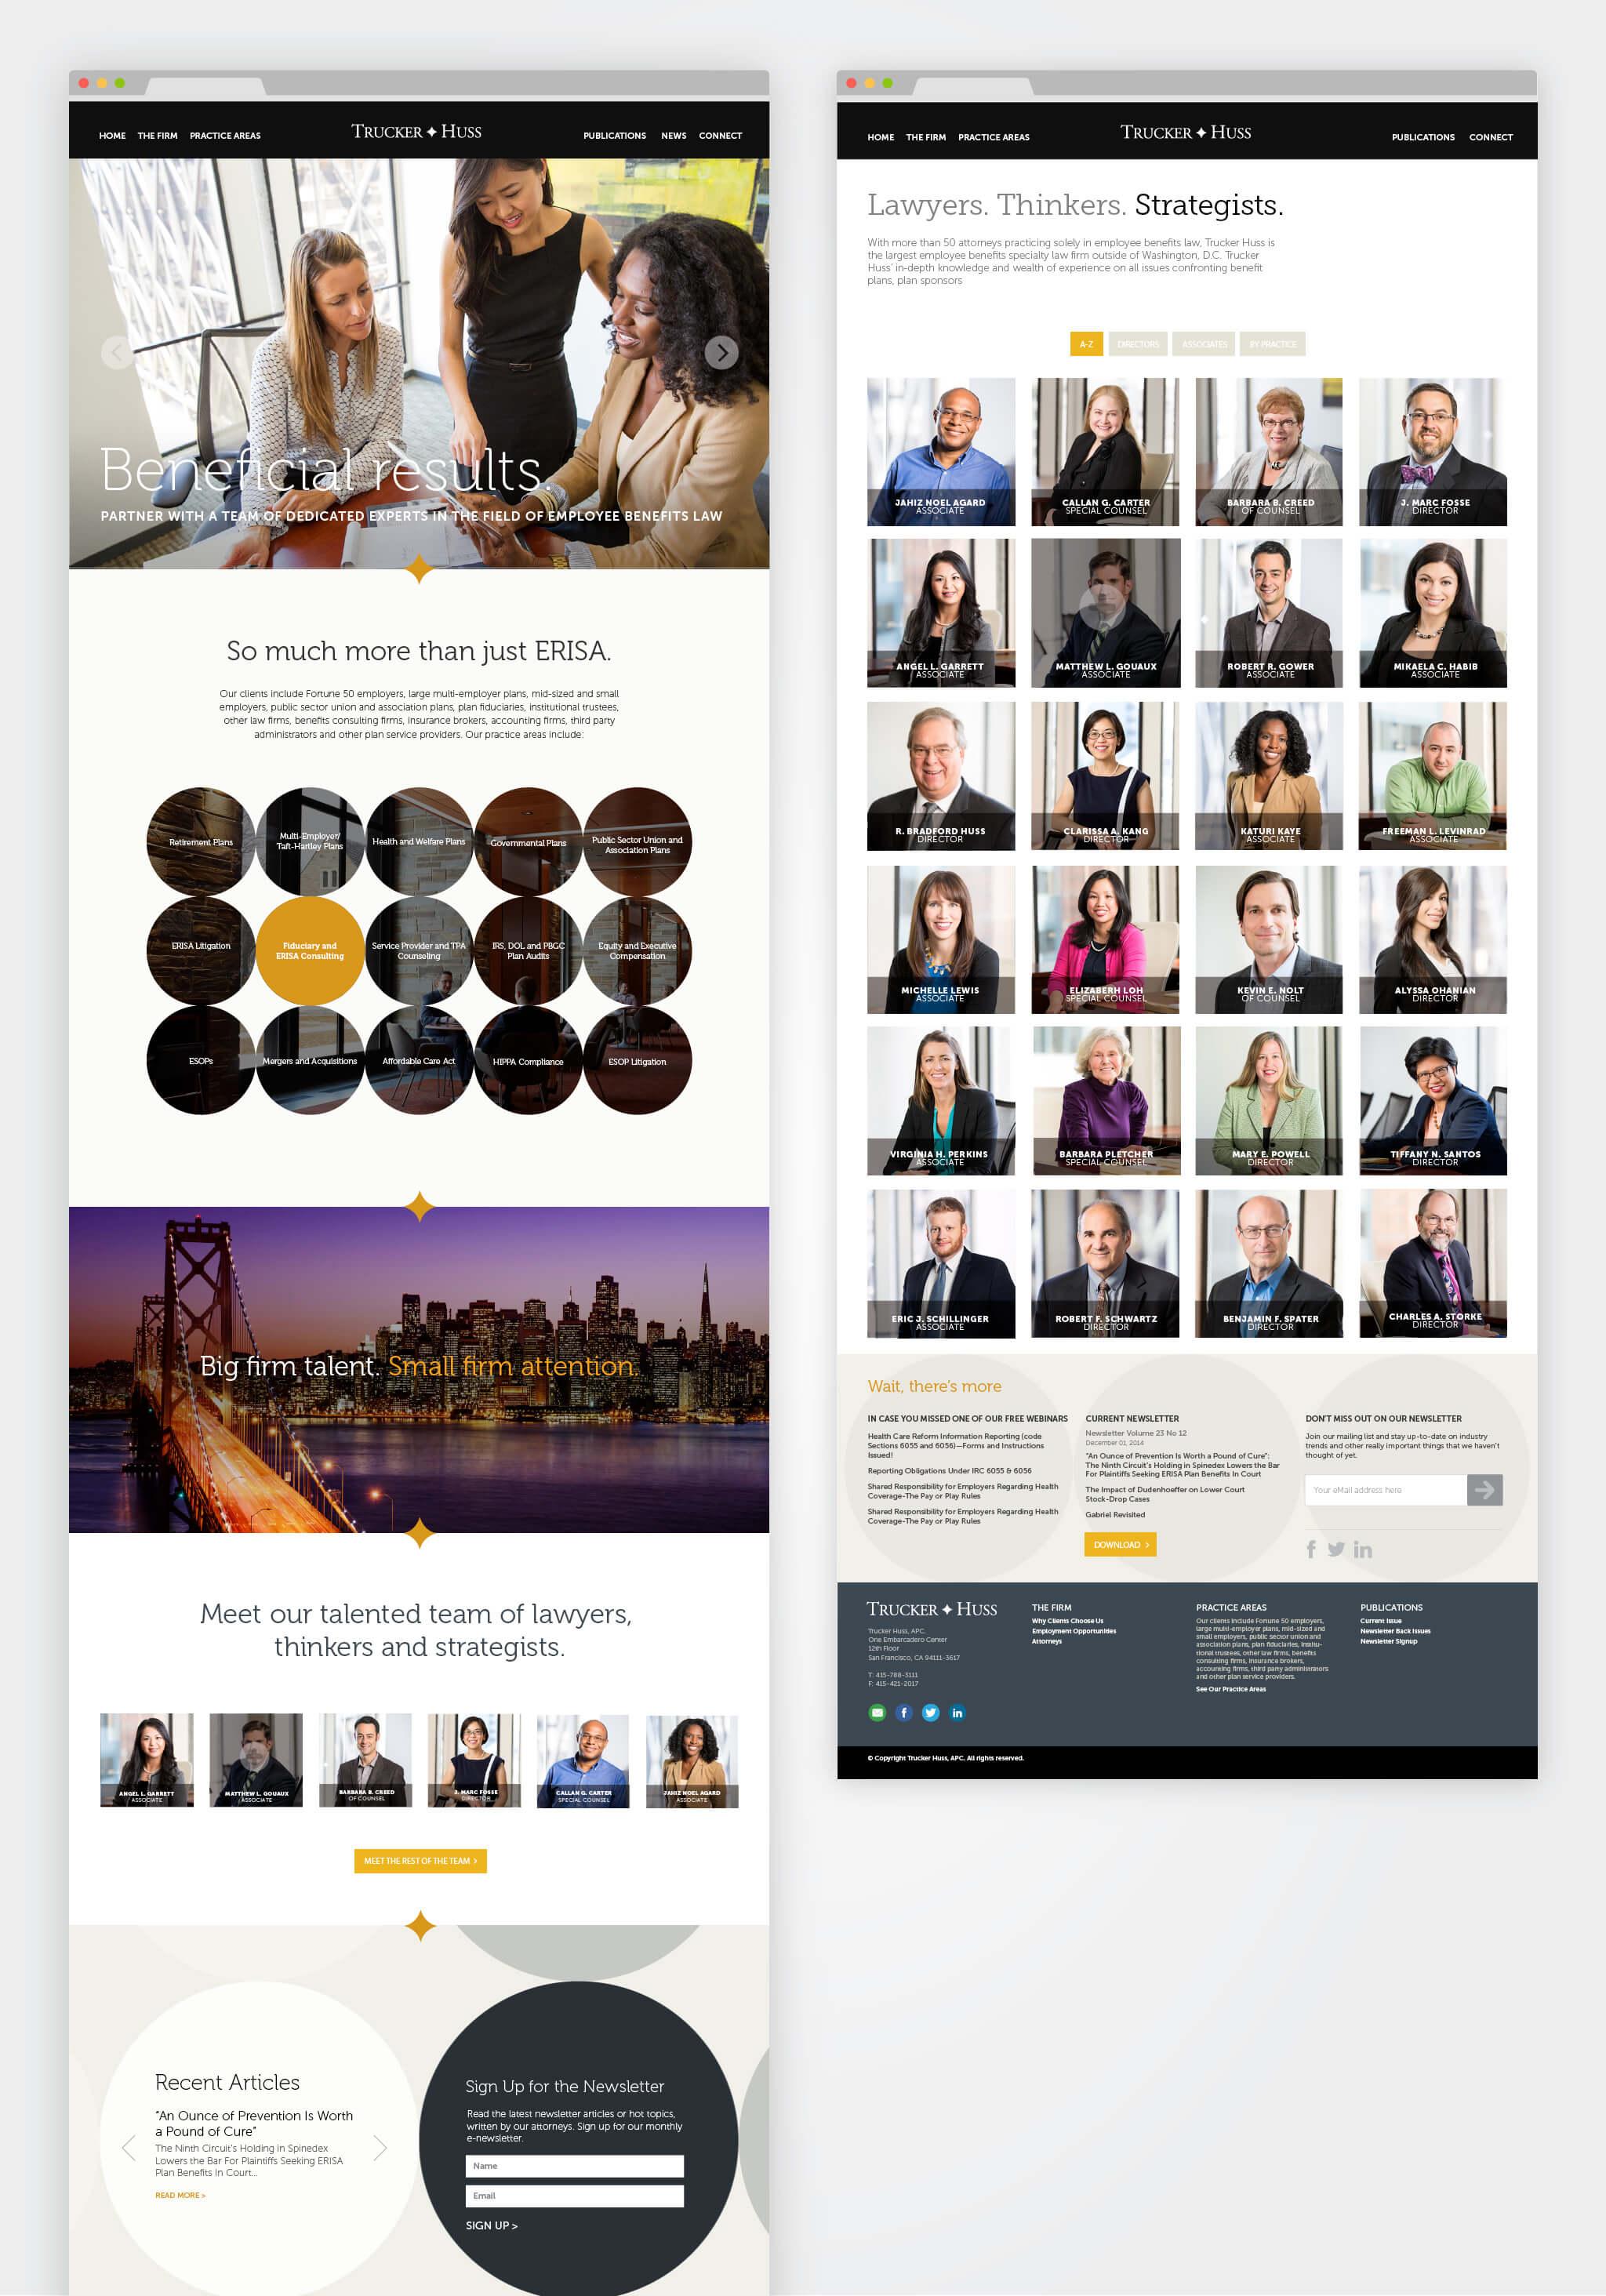 Trucker Huss Law Firm Website » designed by 405 GROUP